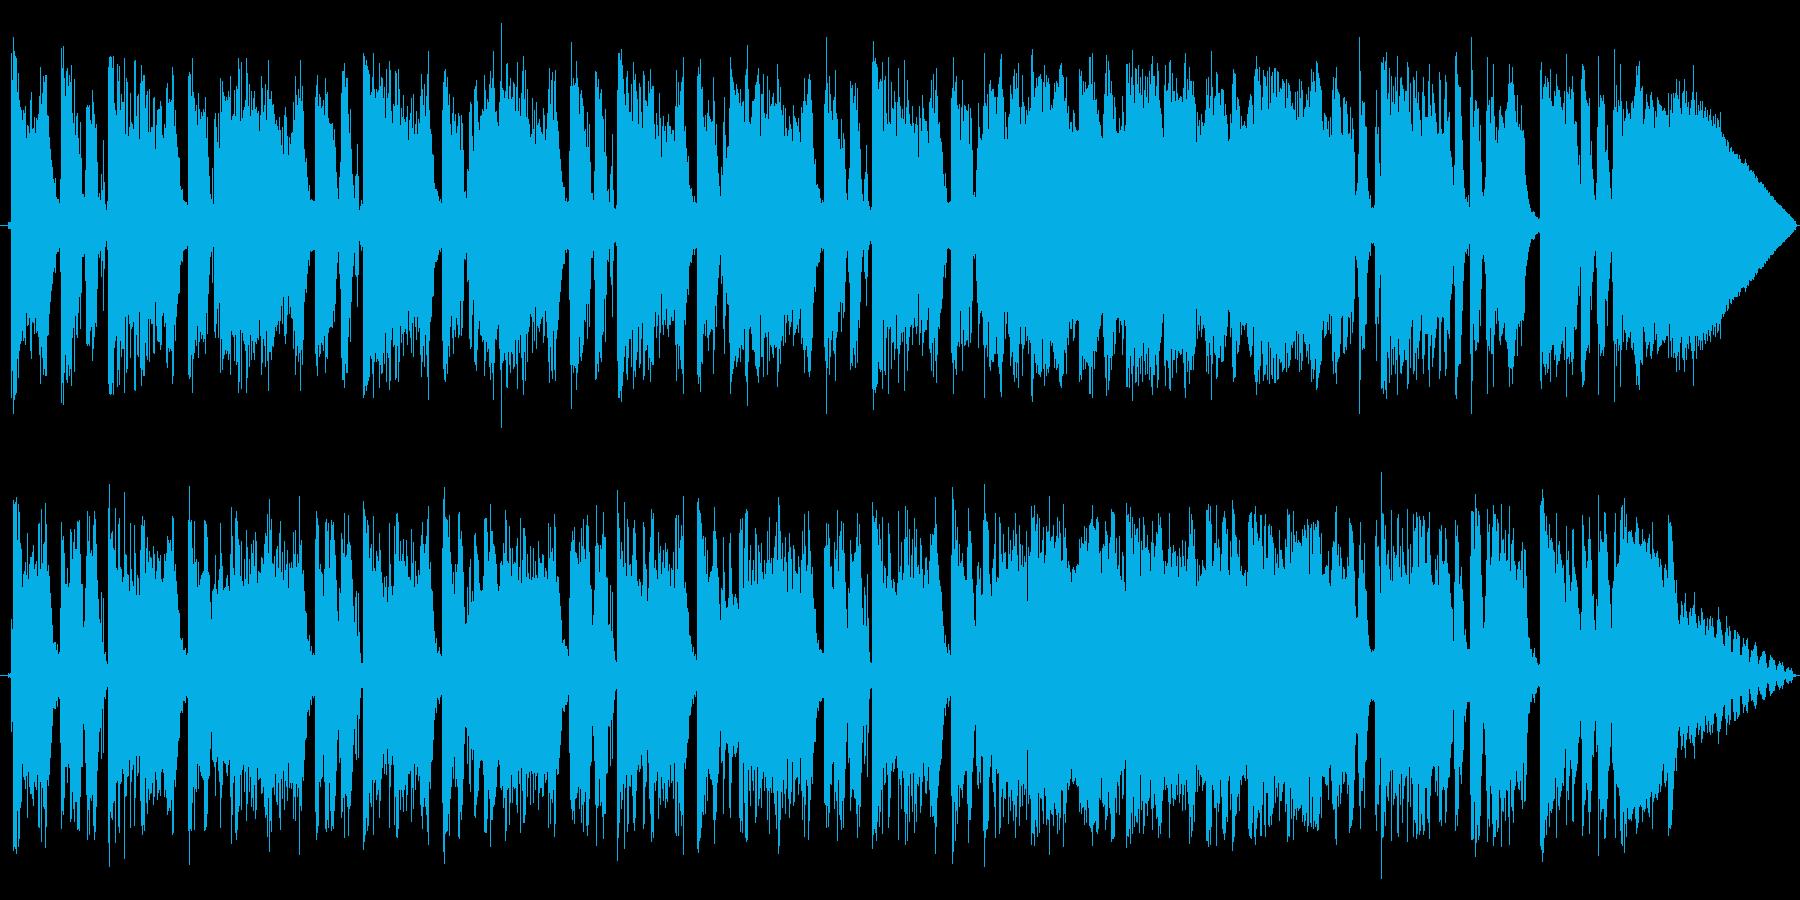 Funky Timeの再生済みの波形